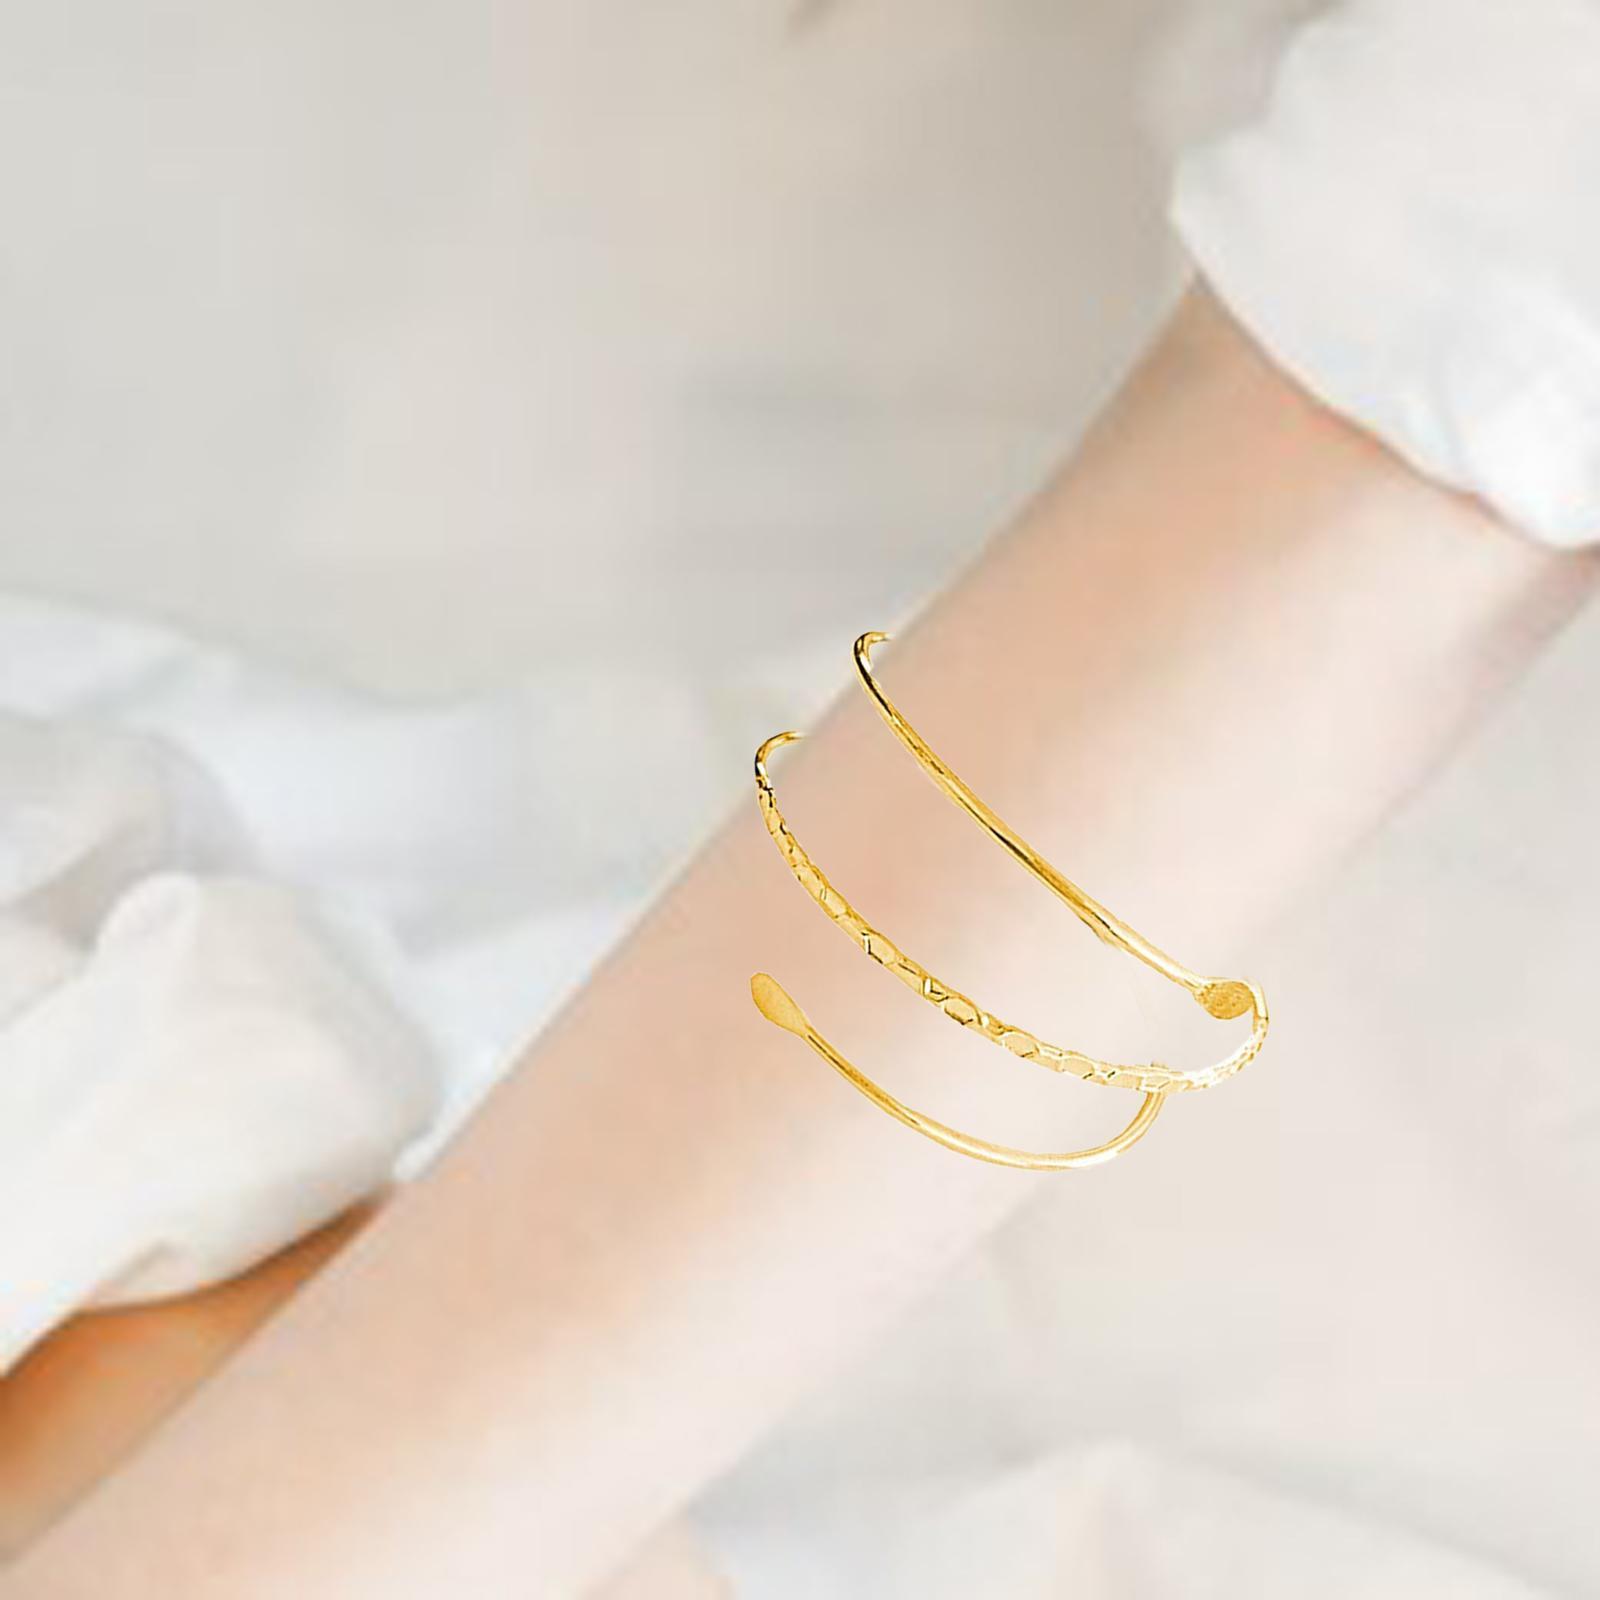 Wrap Spiral Arm Cuff Bracelet Fashion Necklace for Women Men Gifts